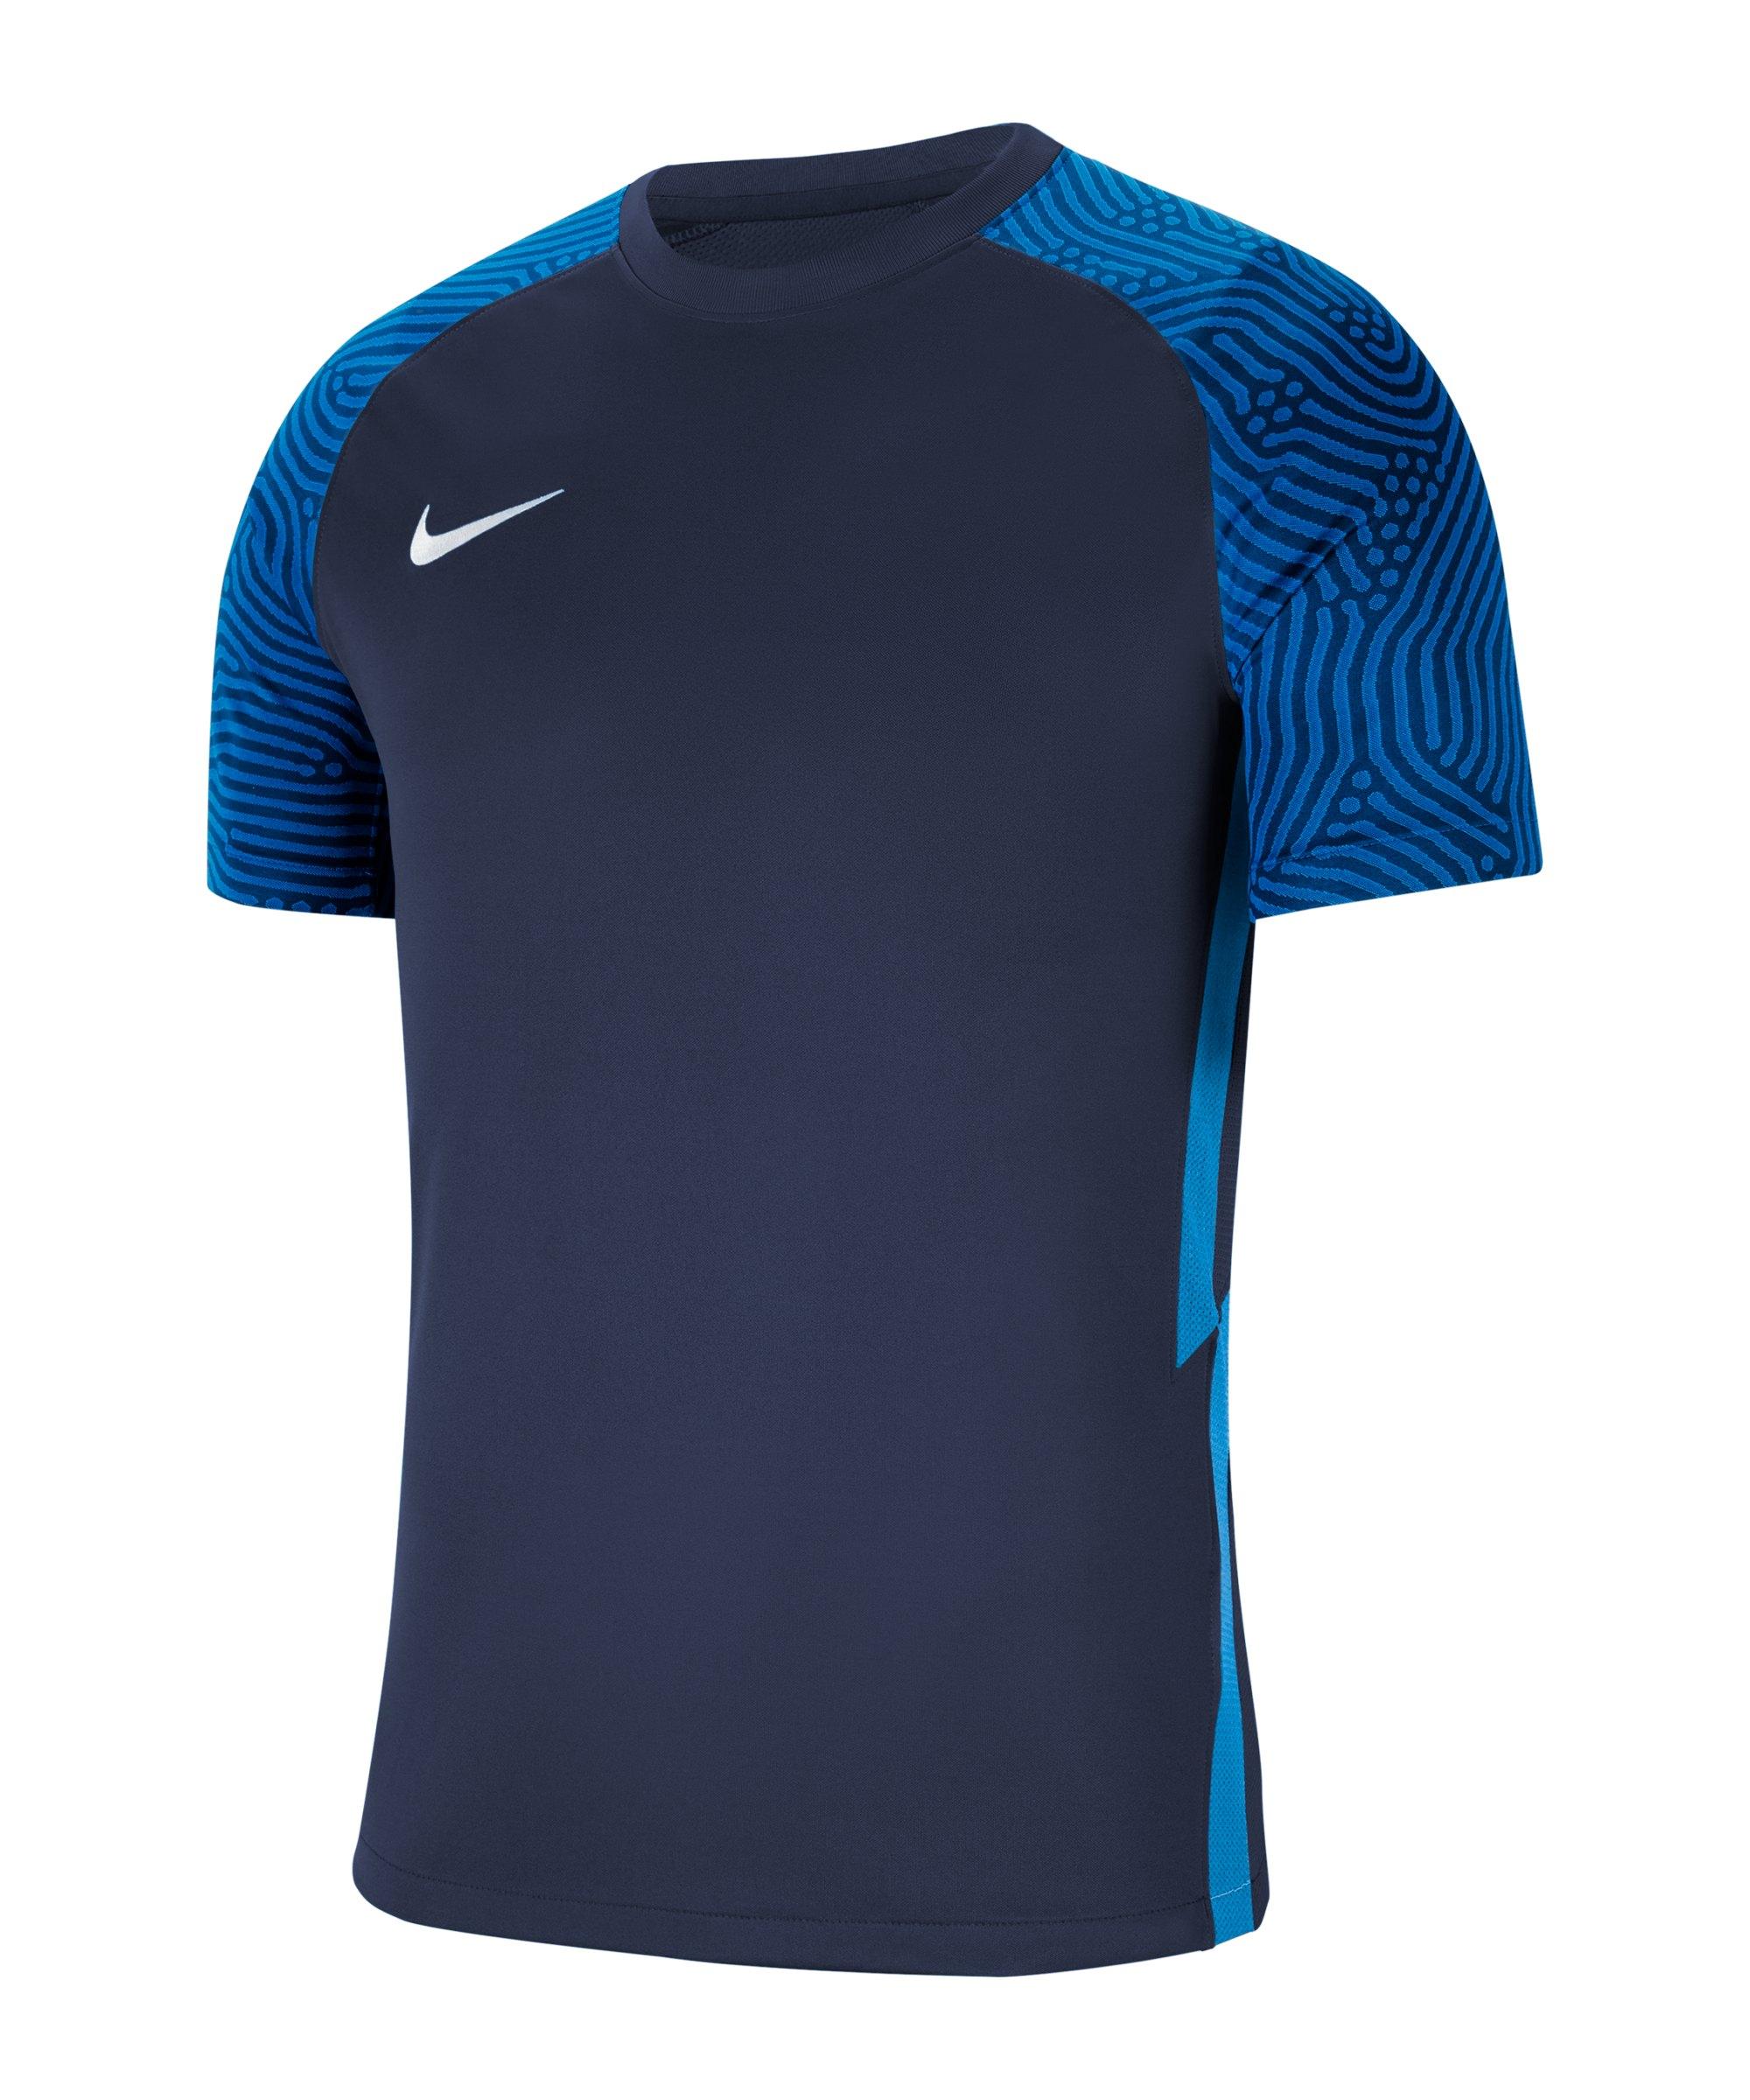 Nike Strike II Trikot kurzarm Blau Weiss F410 - blau